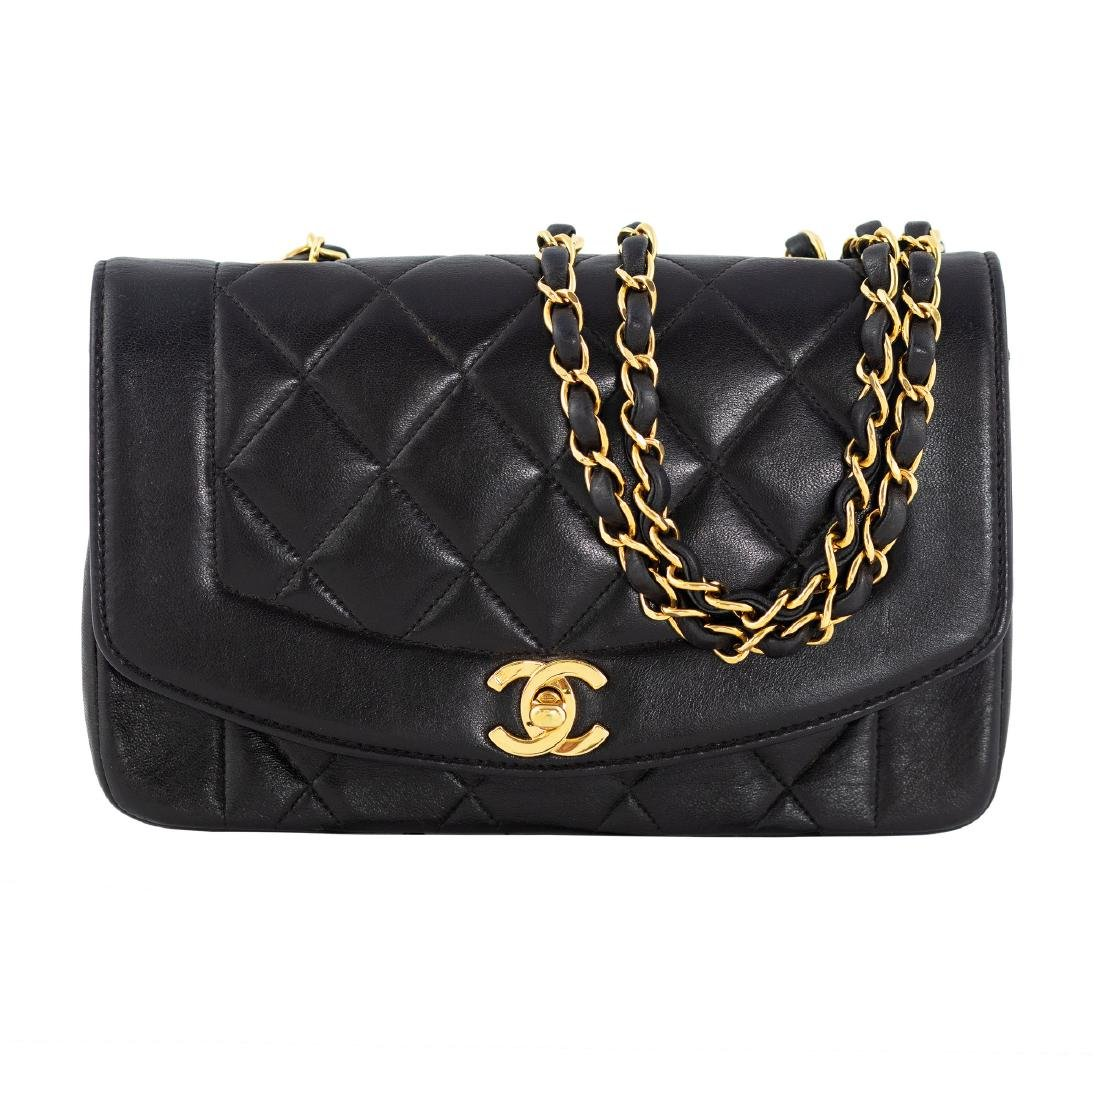 Chanel Diana Mademoiselle Flap Bag